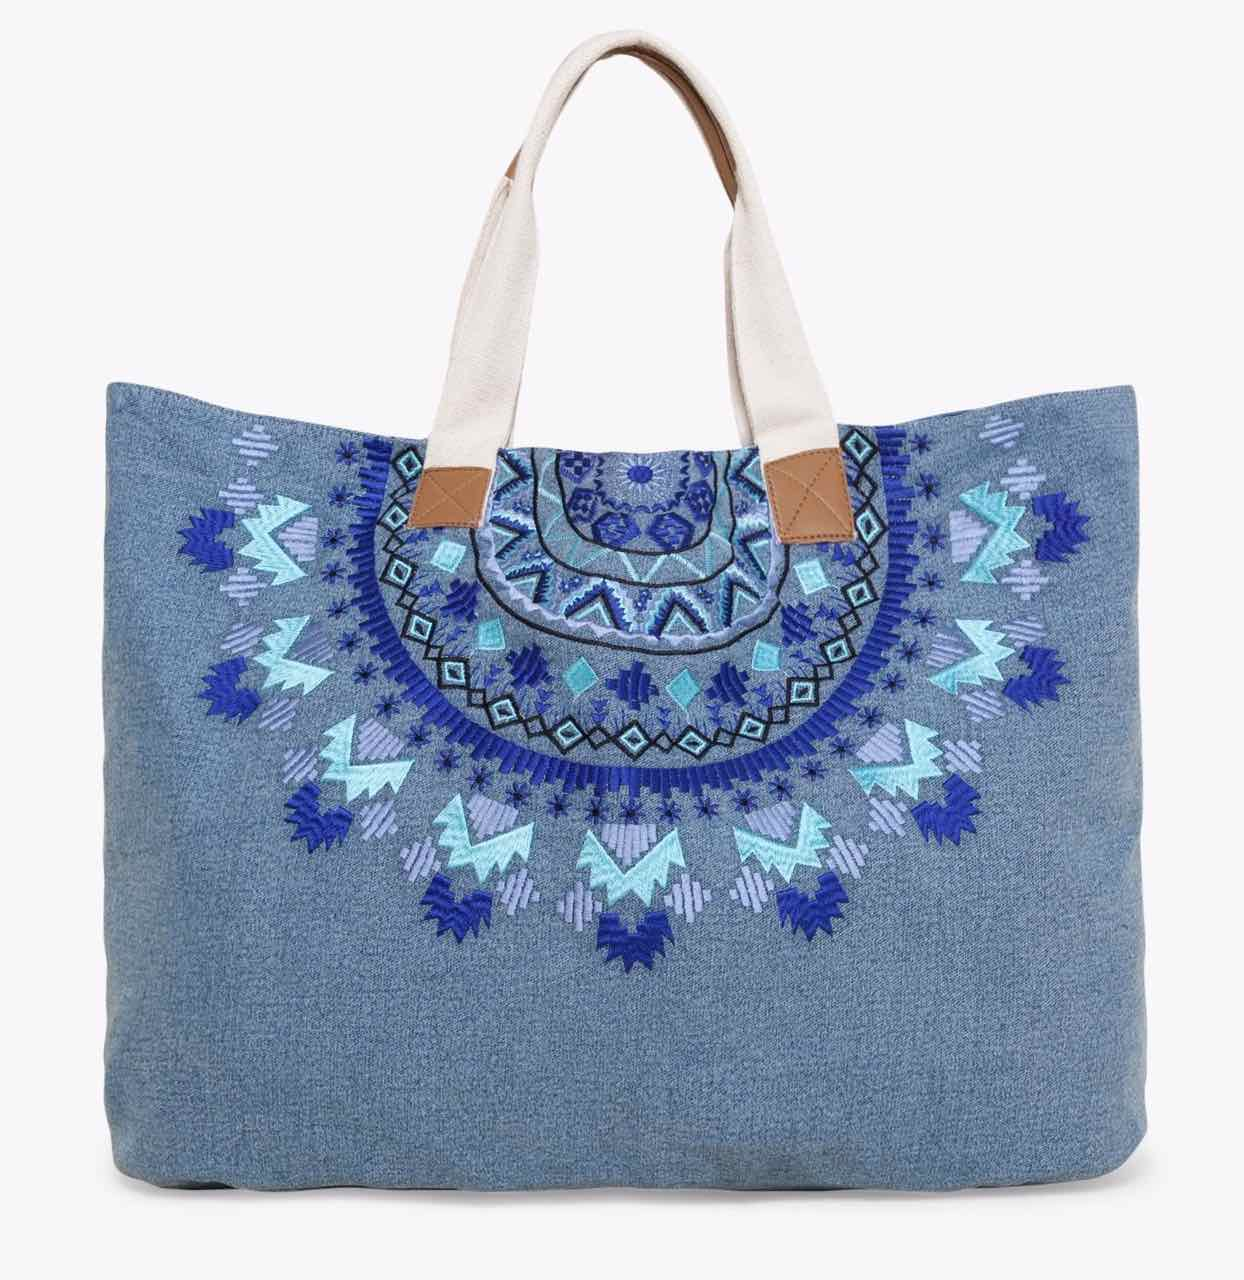 74X9WW1_5000 Desigual Shopper Bag Altea Turner